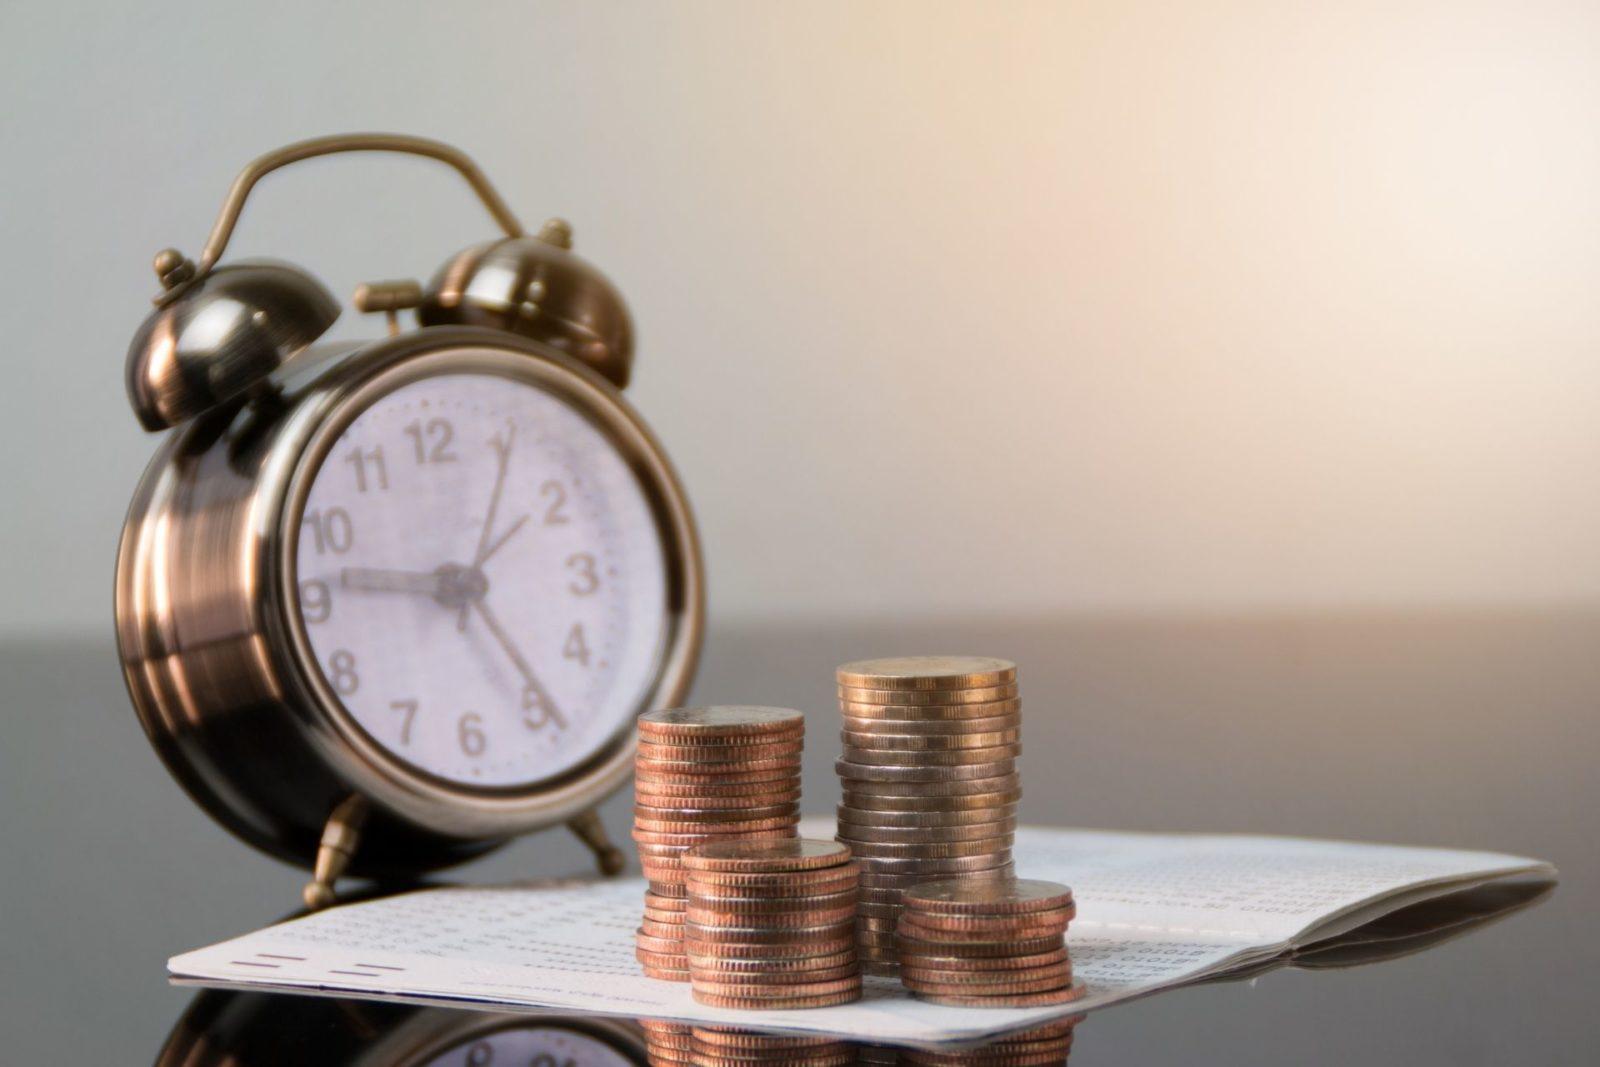 relogio moedas rpv precatorio tempo para pagamento precato